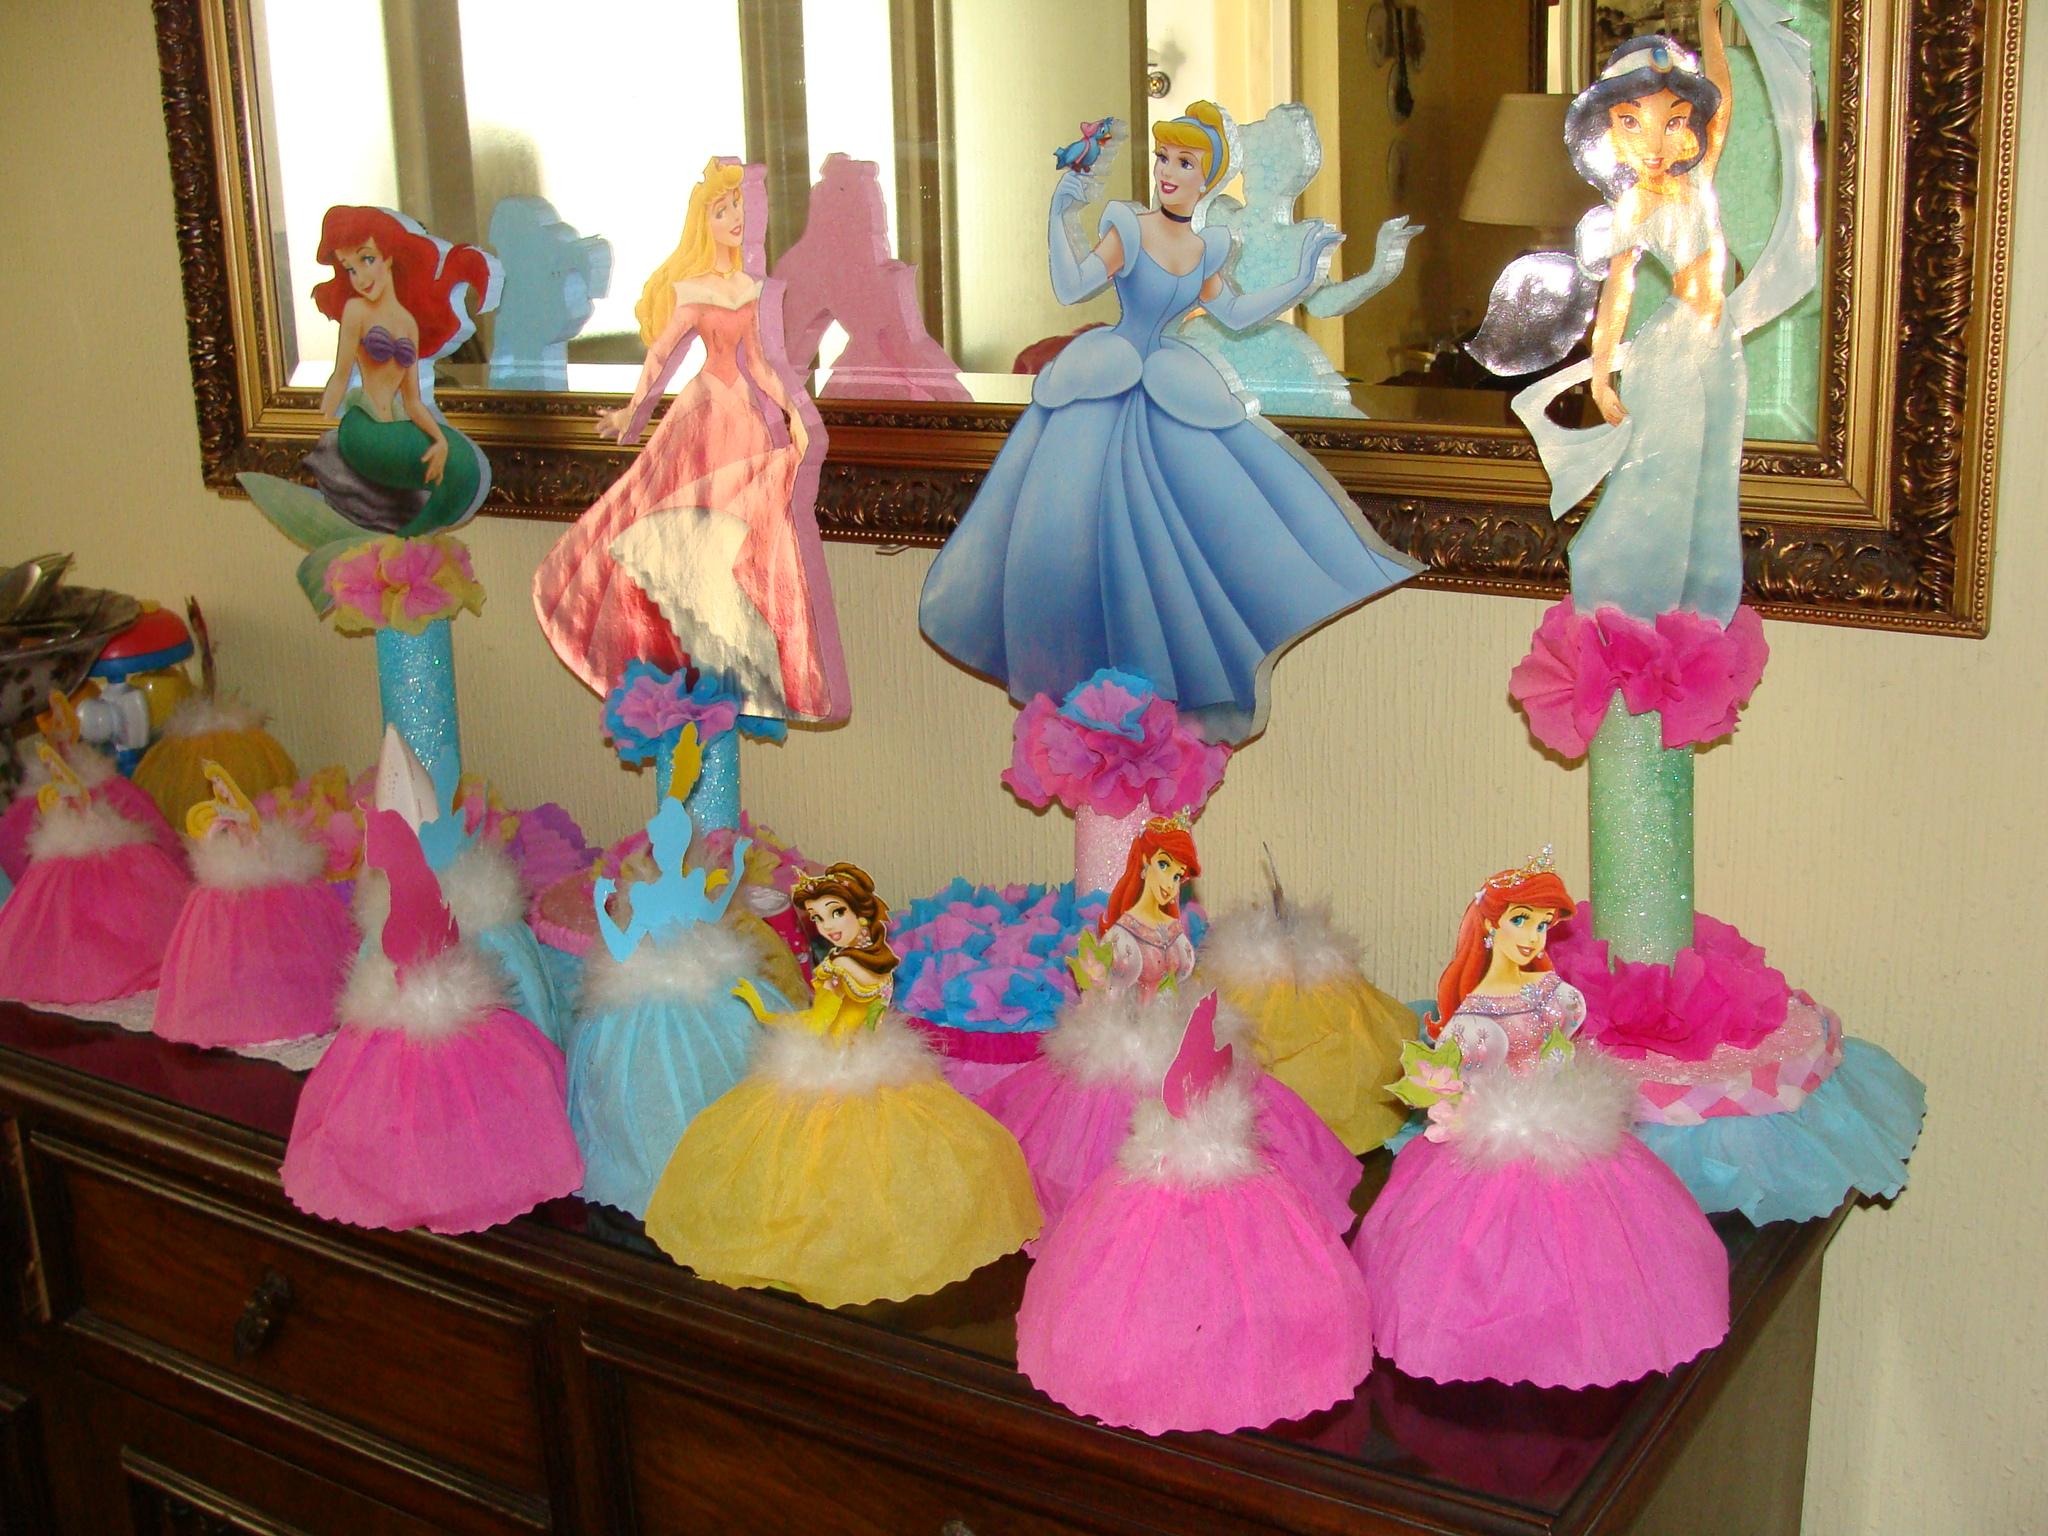 Papel crep la cajita azul de roc o - Fiestas infantiles princesas disney ...